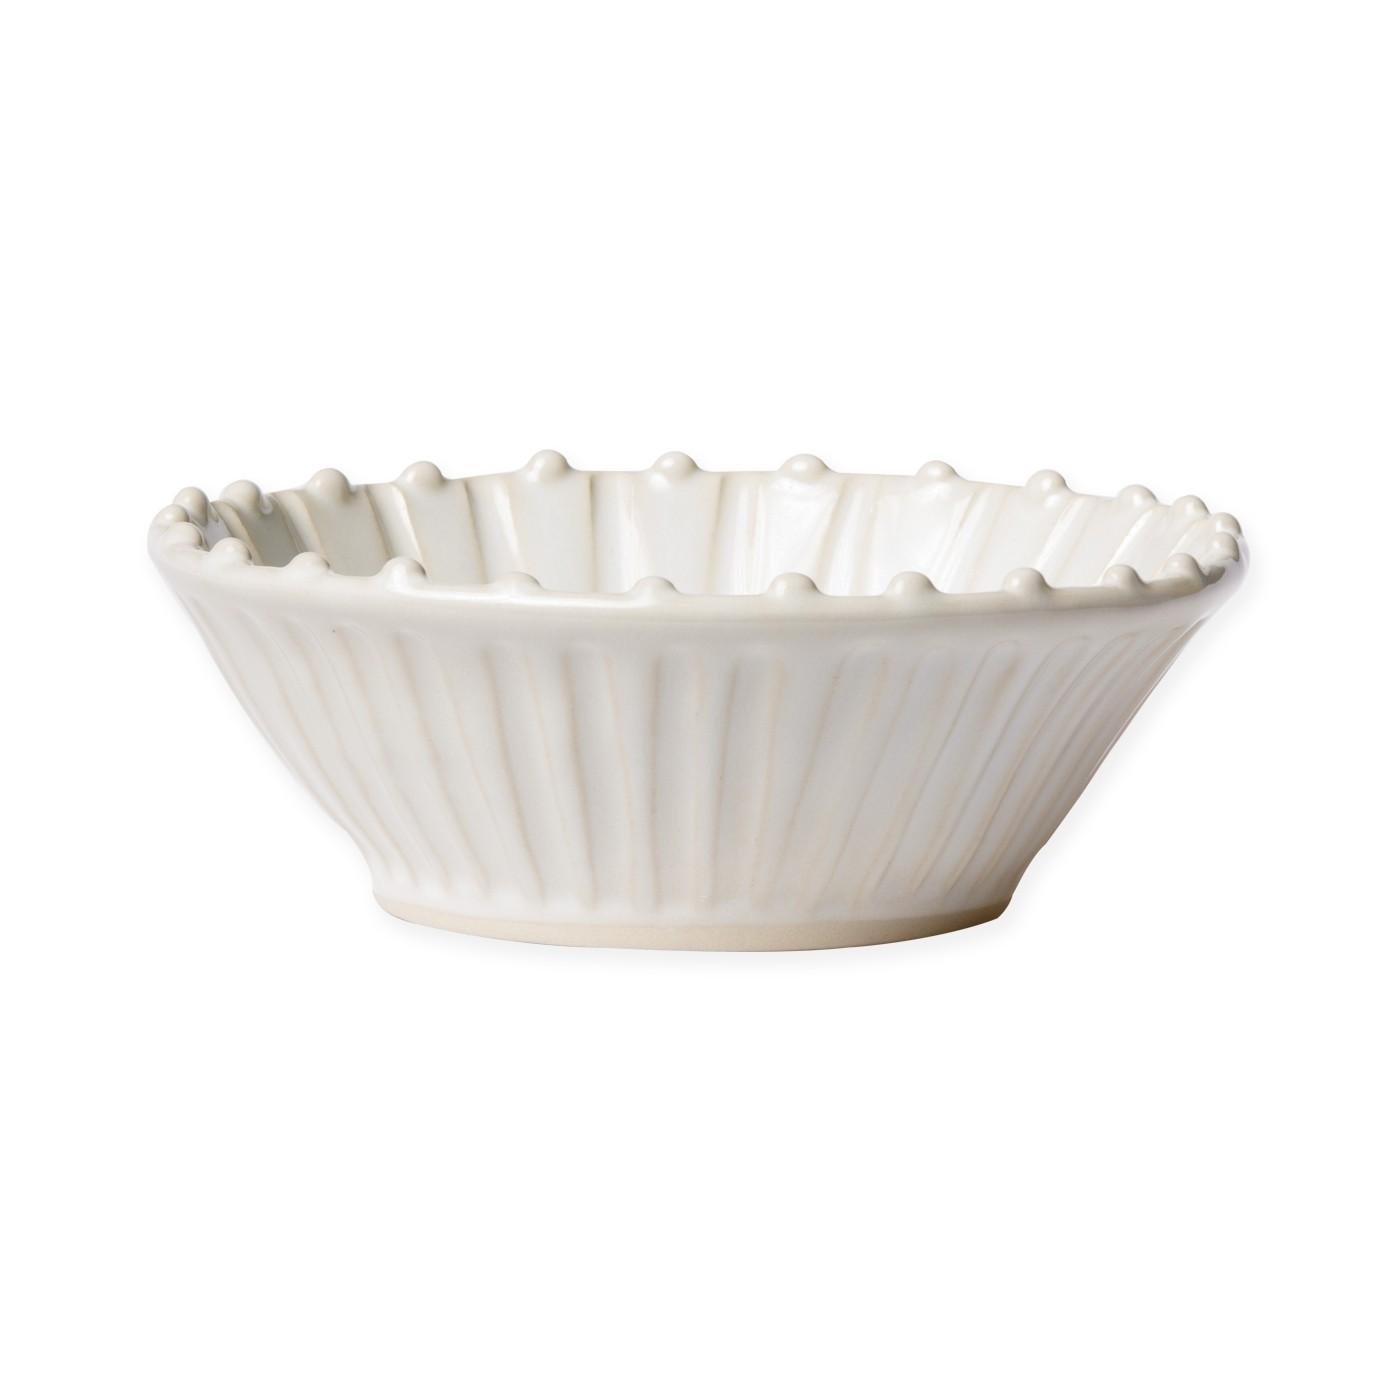 Incanto Stone Linen Stripe Cereal Bowl - 6.75 in. d 2.25 in. h  sc 1 st  Gracious Style & Vietri Stripe Dinnerware | Gracious Style